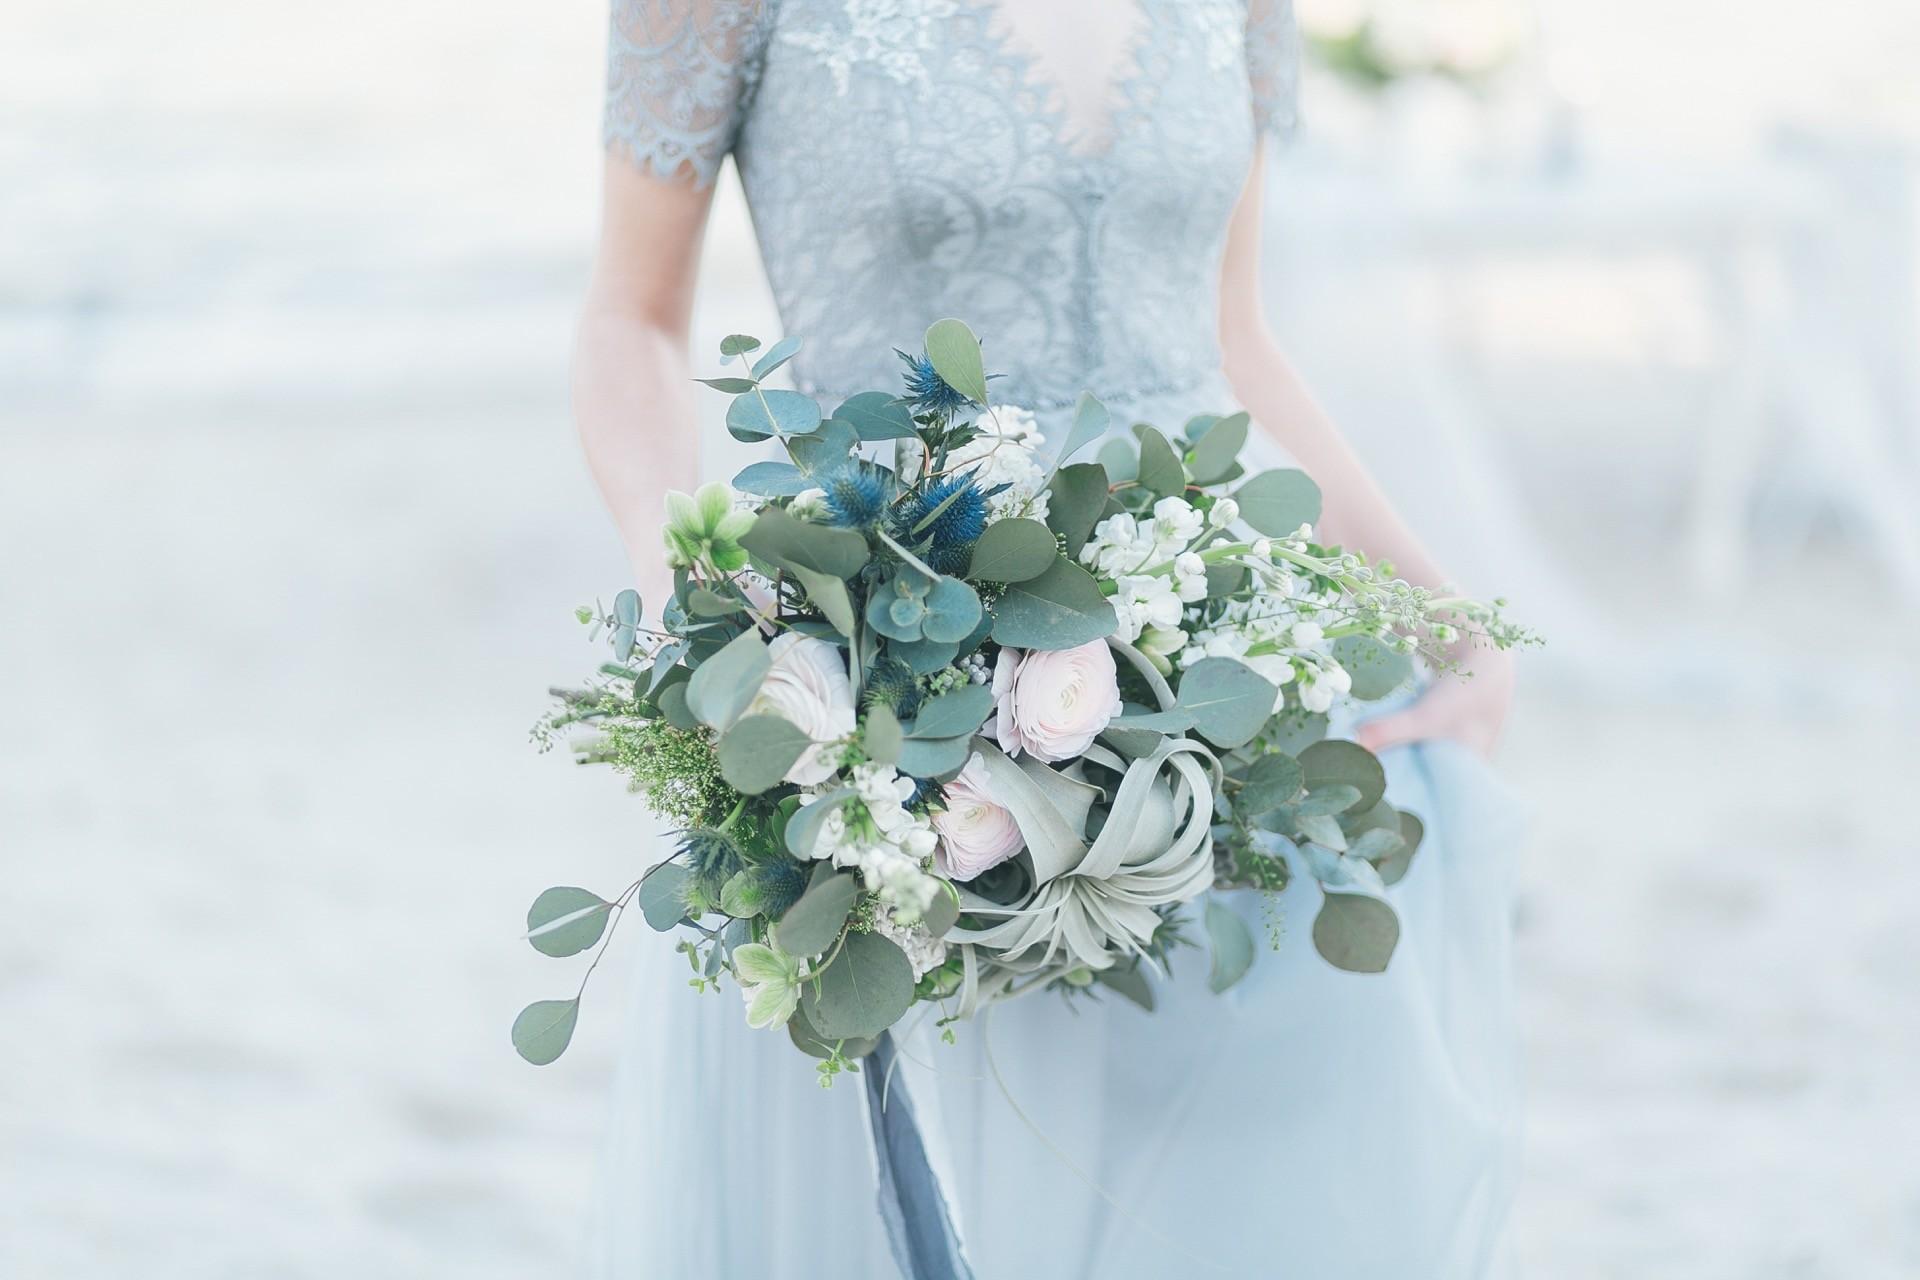 Hochzeitsblume Eukalyptus